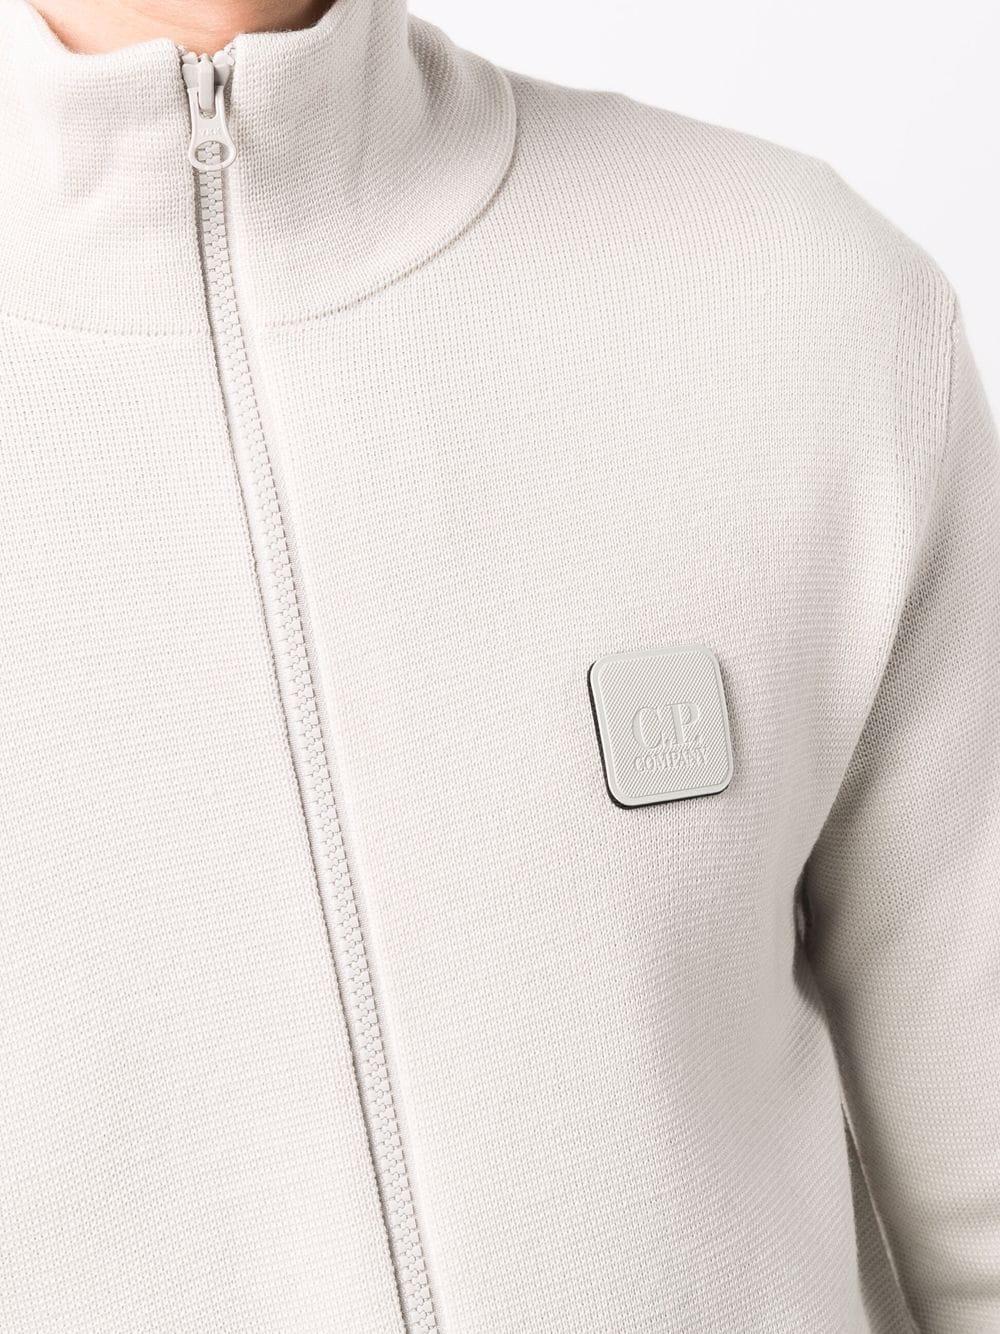 cardigan con logo uomo bianco in lana C.P. COMPANY | Maglieria | 11CMKN124A005292A116